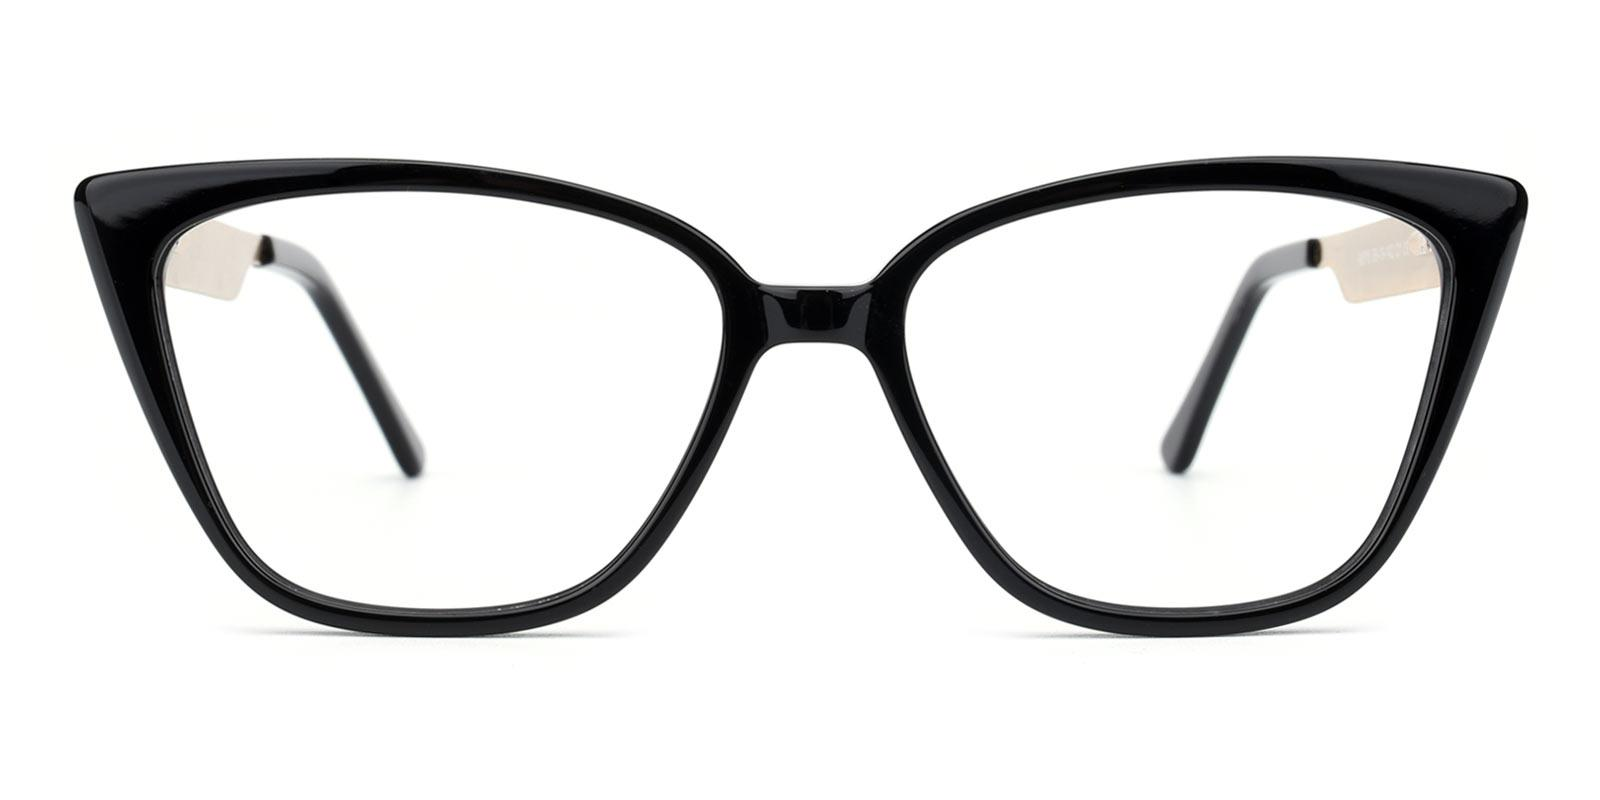 Venus-Black-Cat-Acetate-Eyeglasses-detail